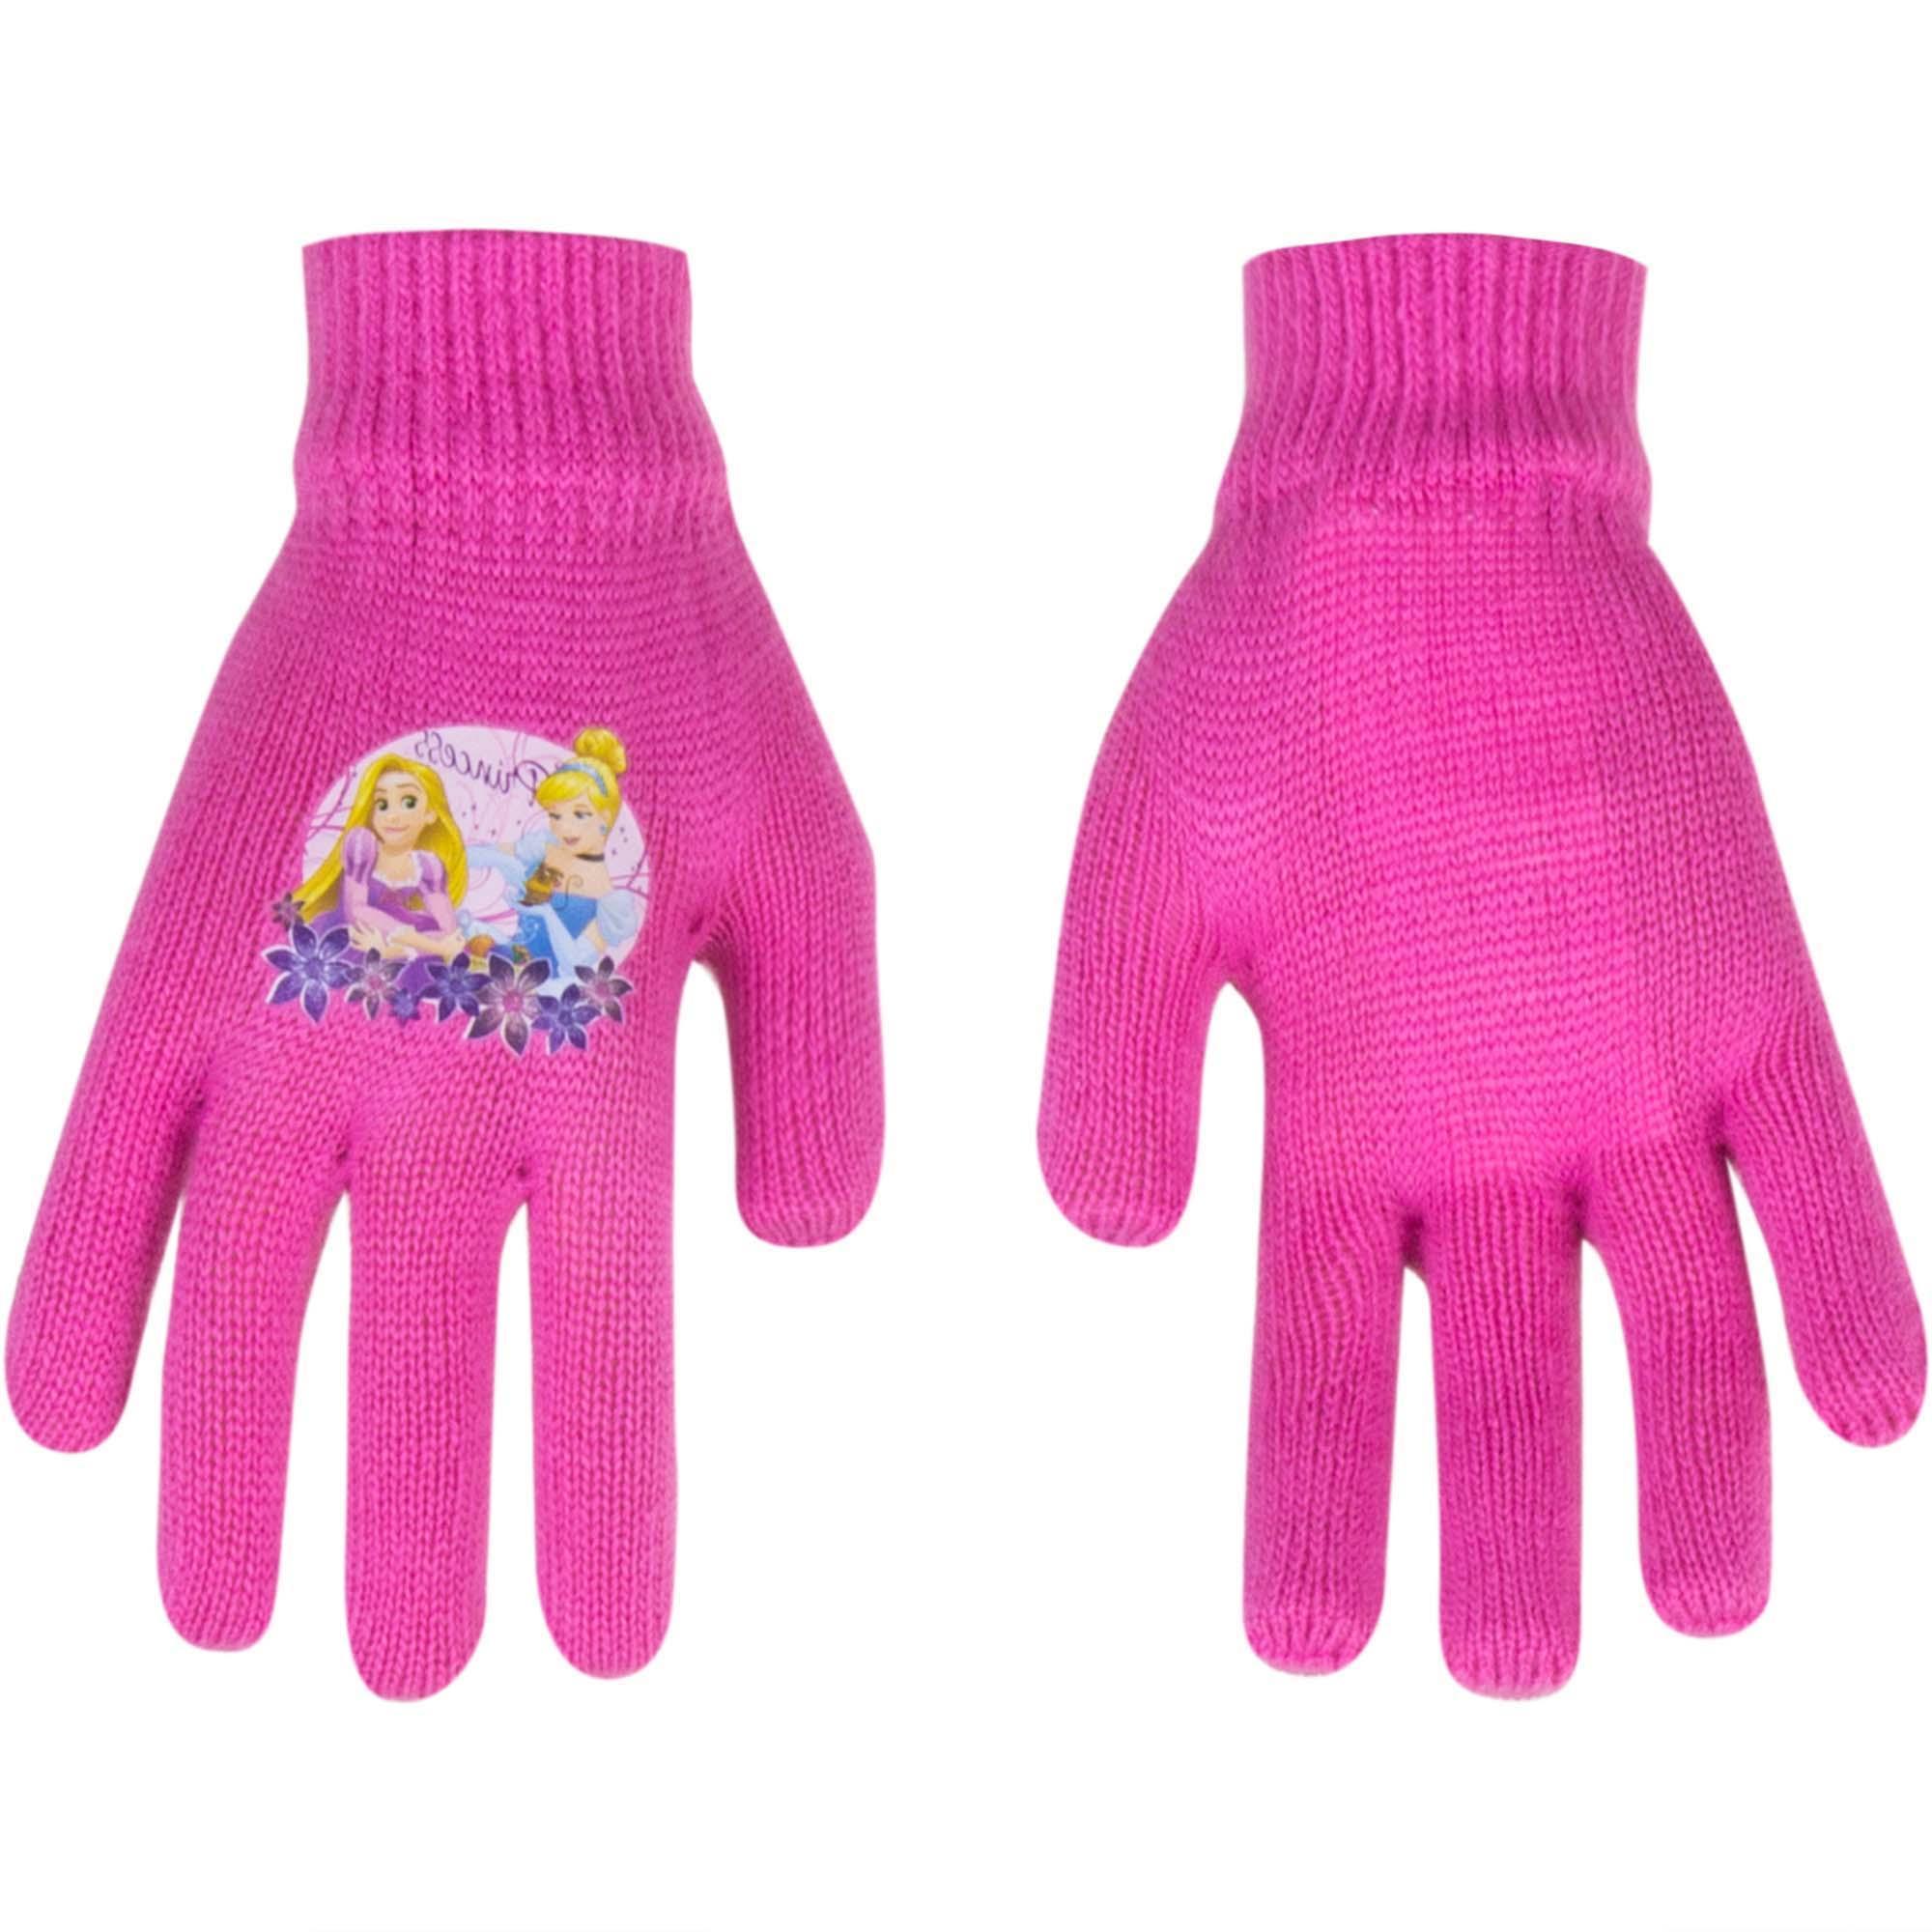 Princess gloves Magic Fuxia (Age: 2-5 years)